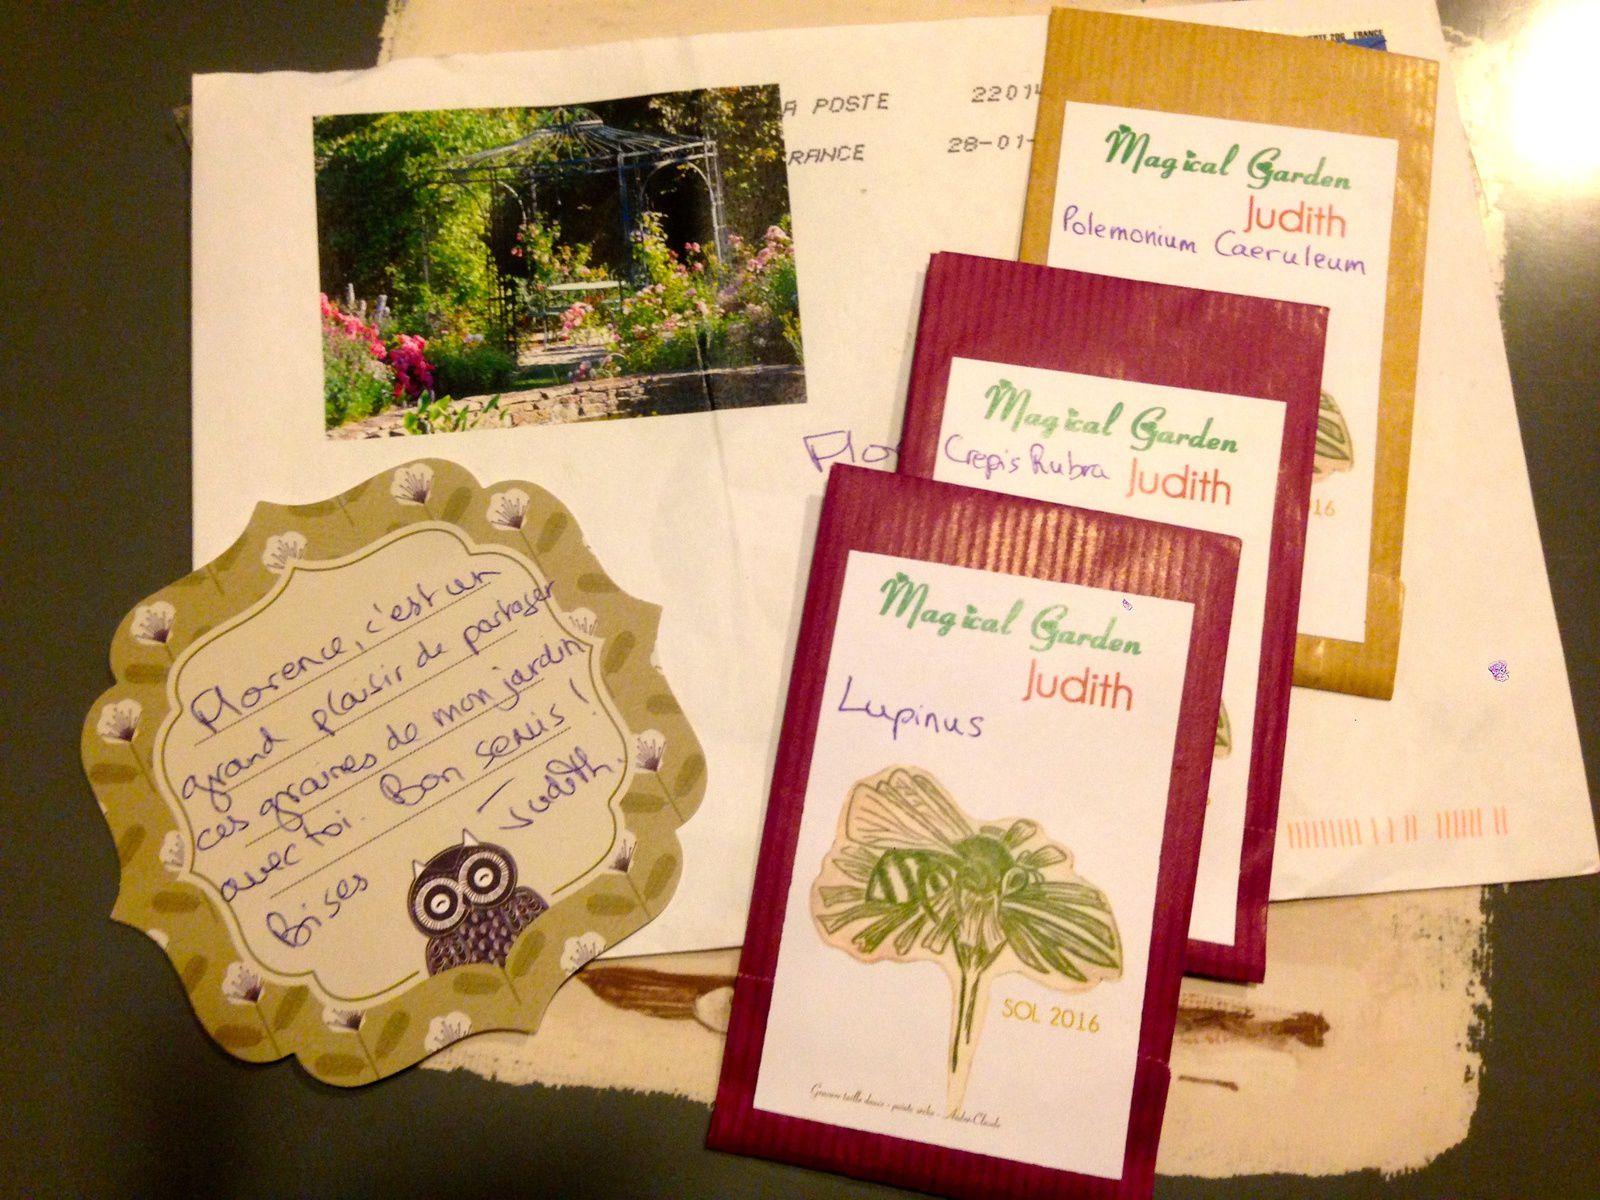 Merci aux seedlovers - Judith de Champagne